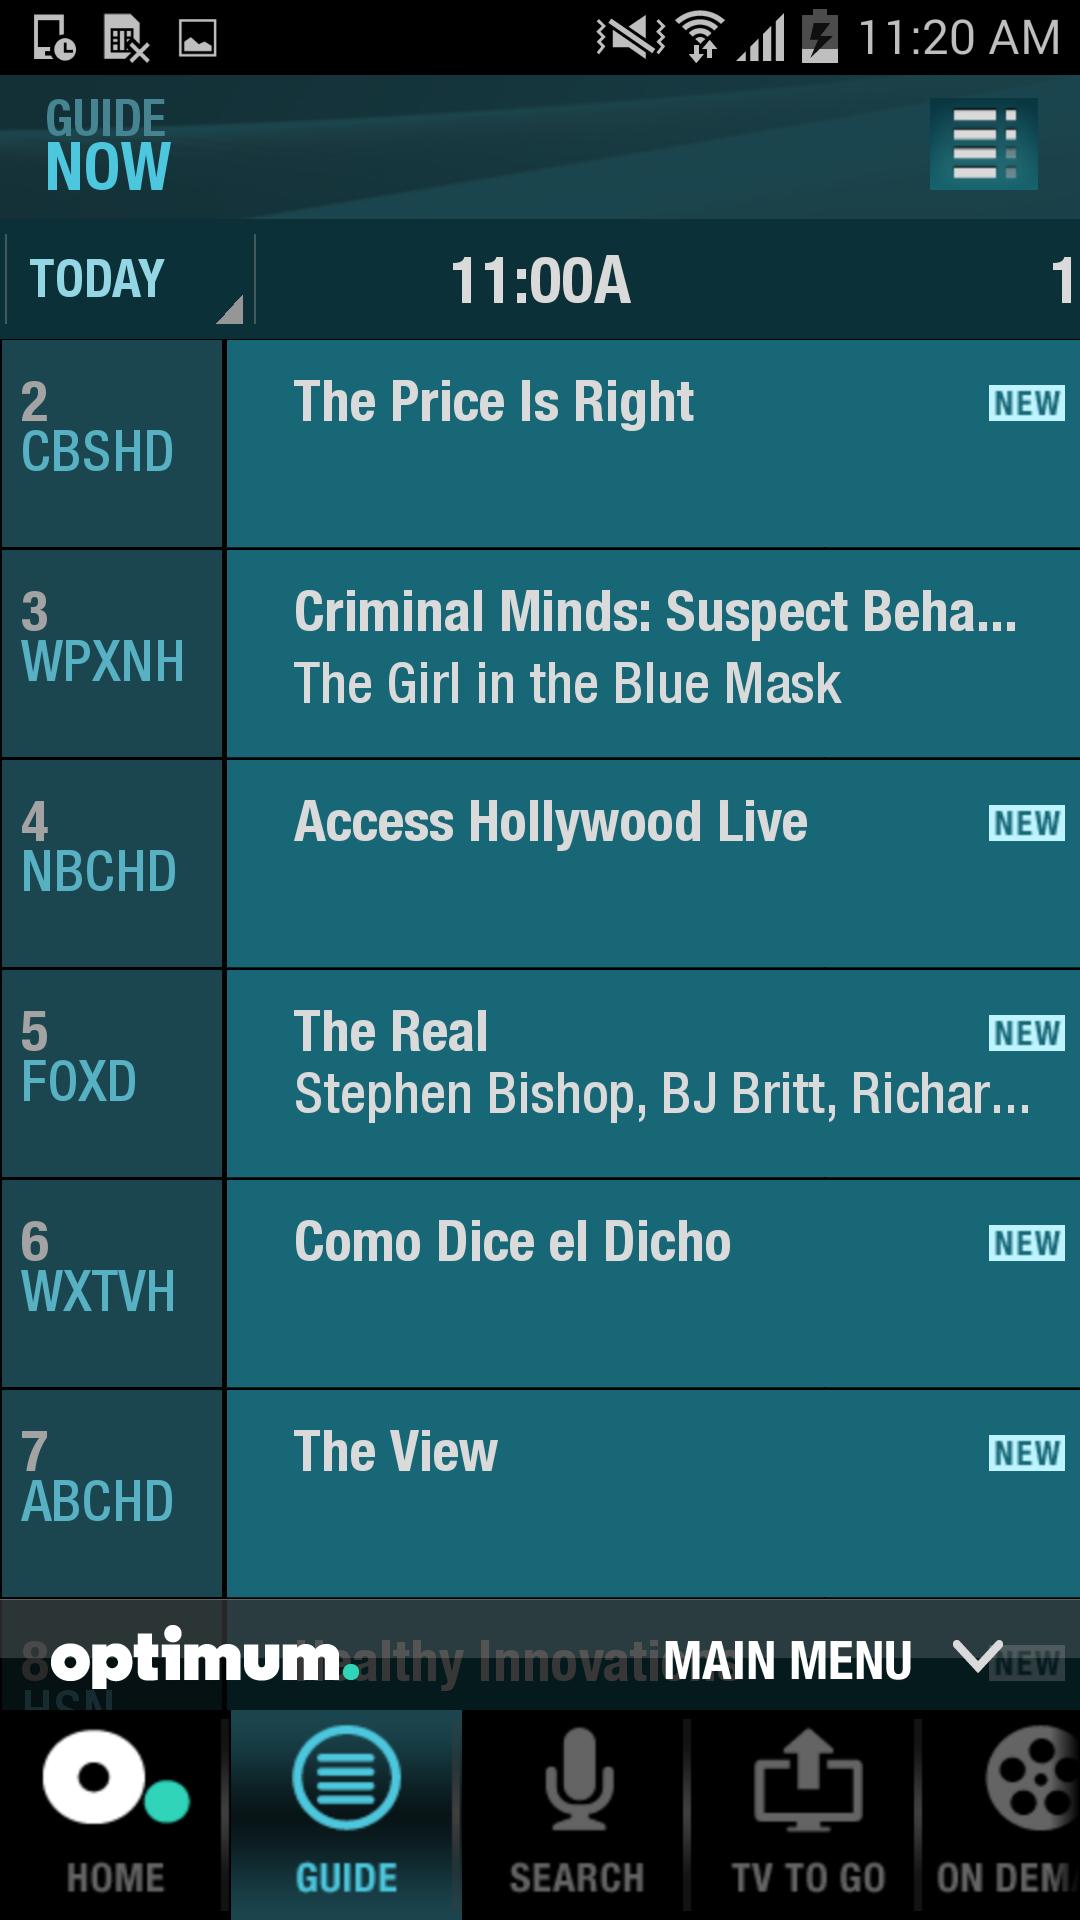 Optimum TV Guide | WhistleOut